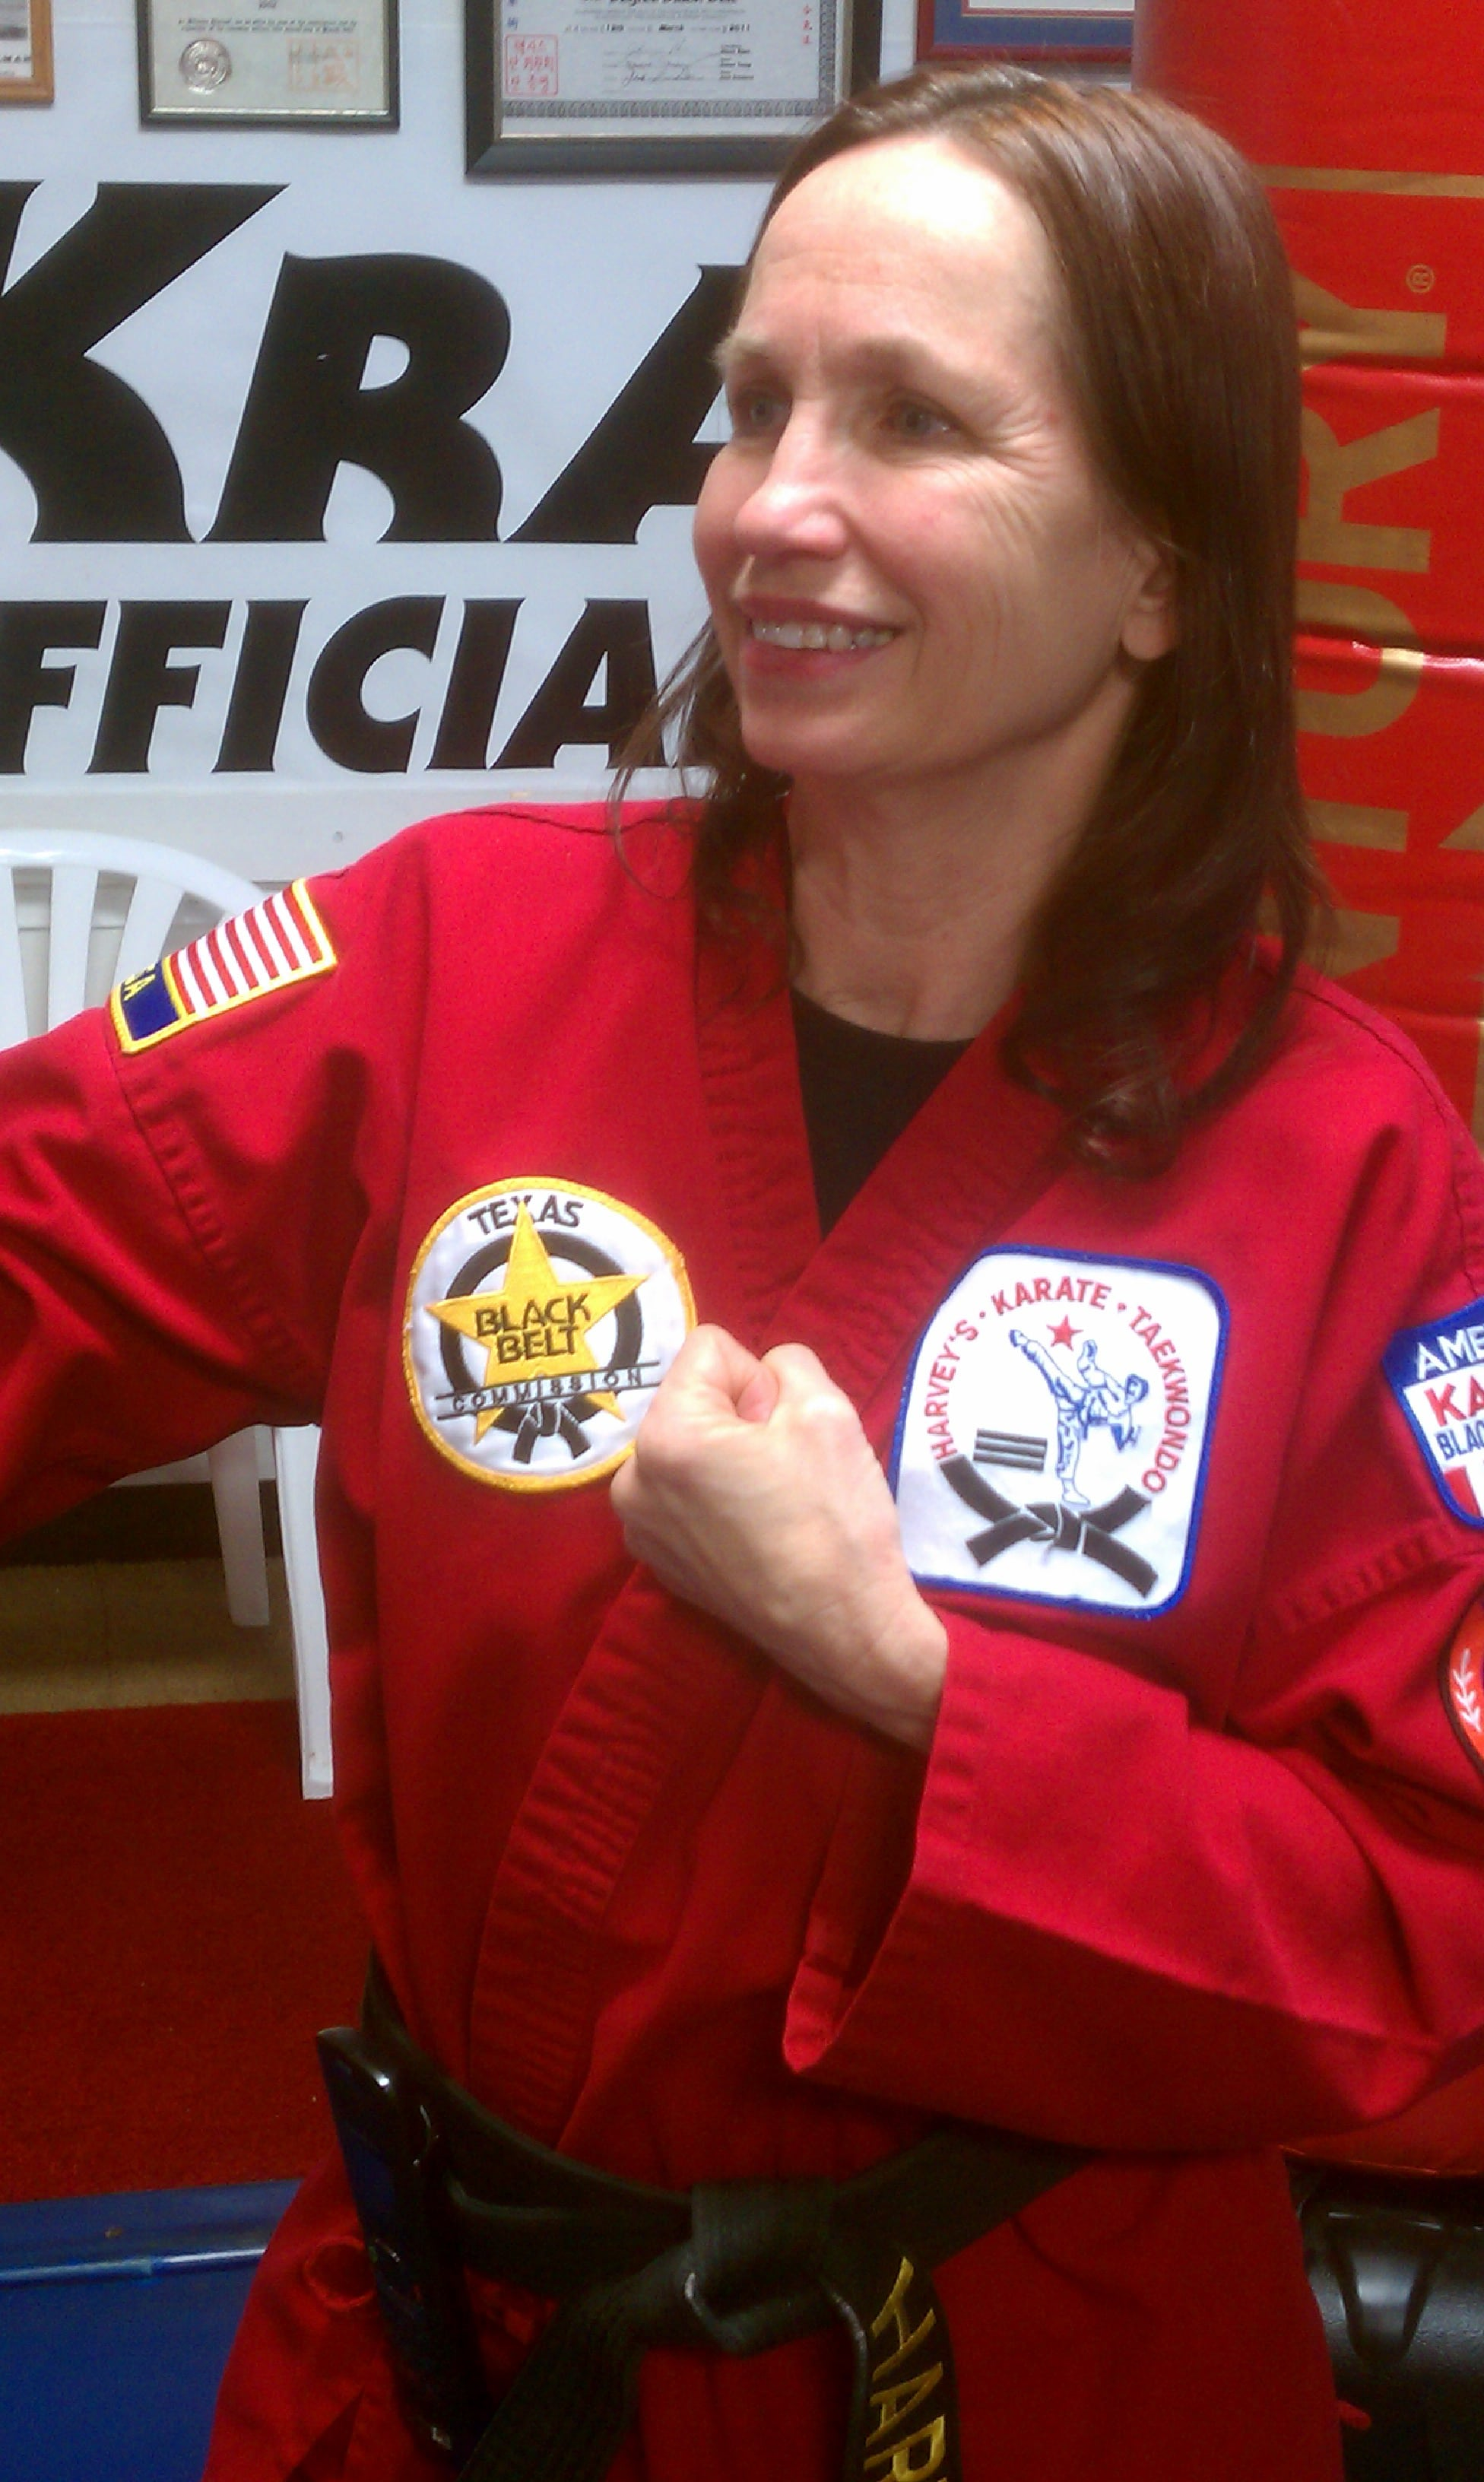 Barbara Harvey in Amarillo - Harvey's Karate & Fitness